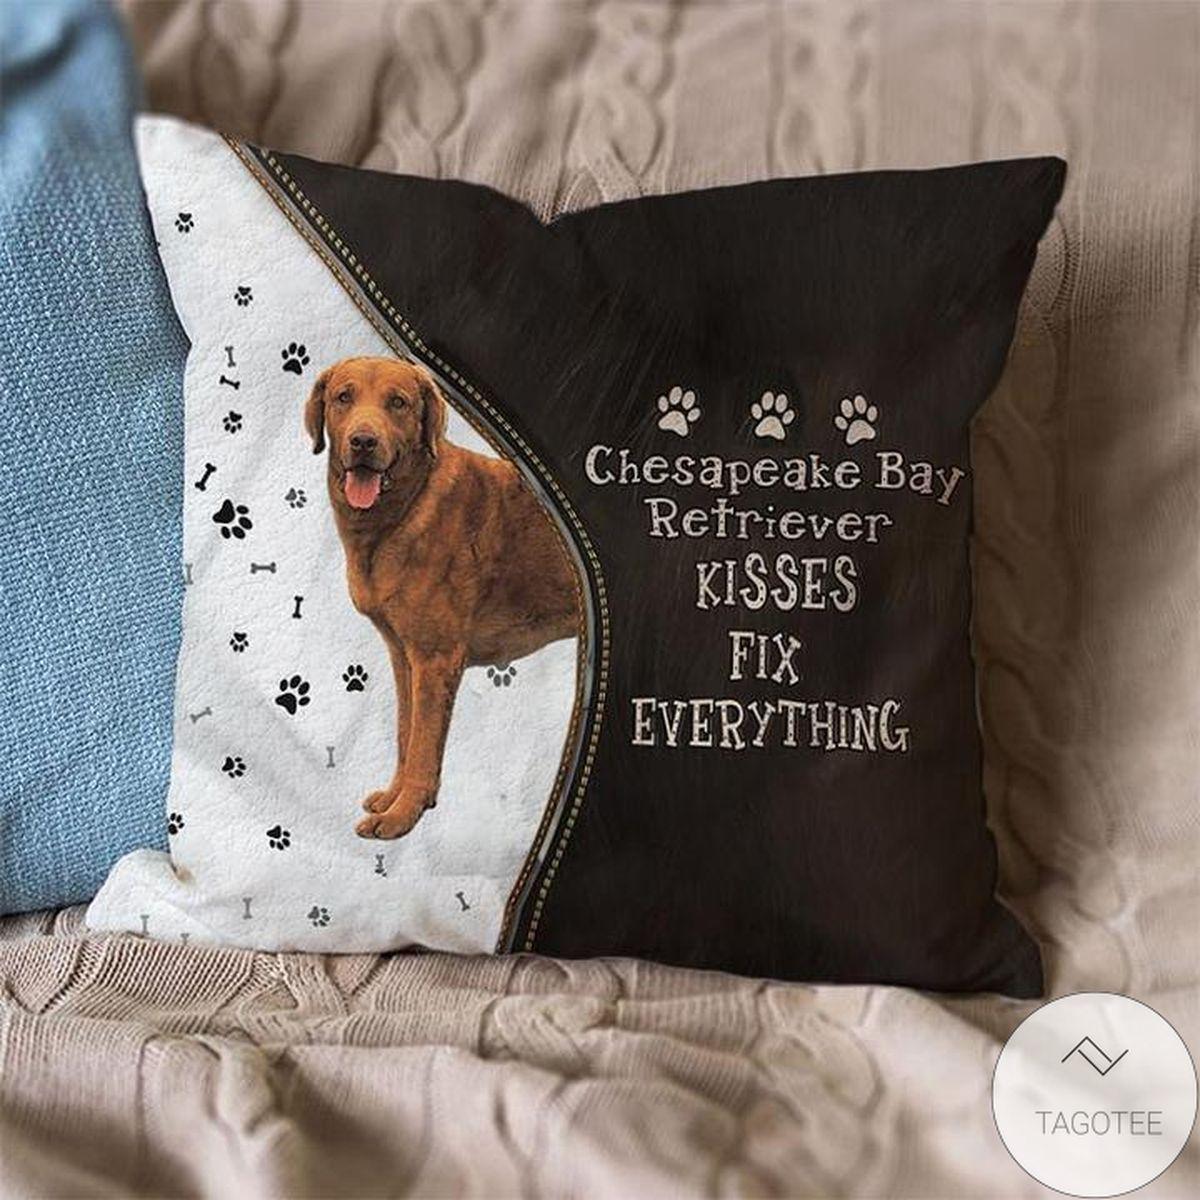 Fantastic Chesapeake Bay Retriever Kisses Fix Everything Pillowcase